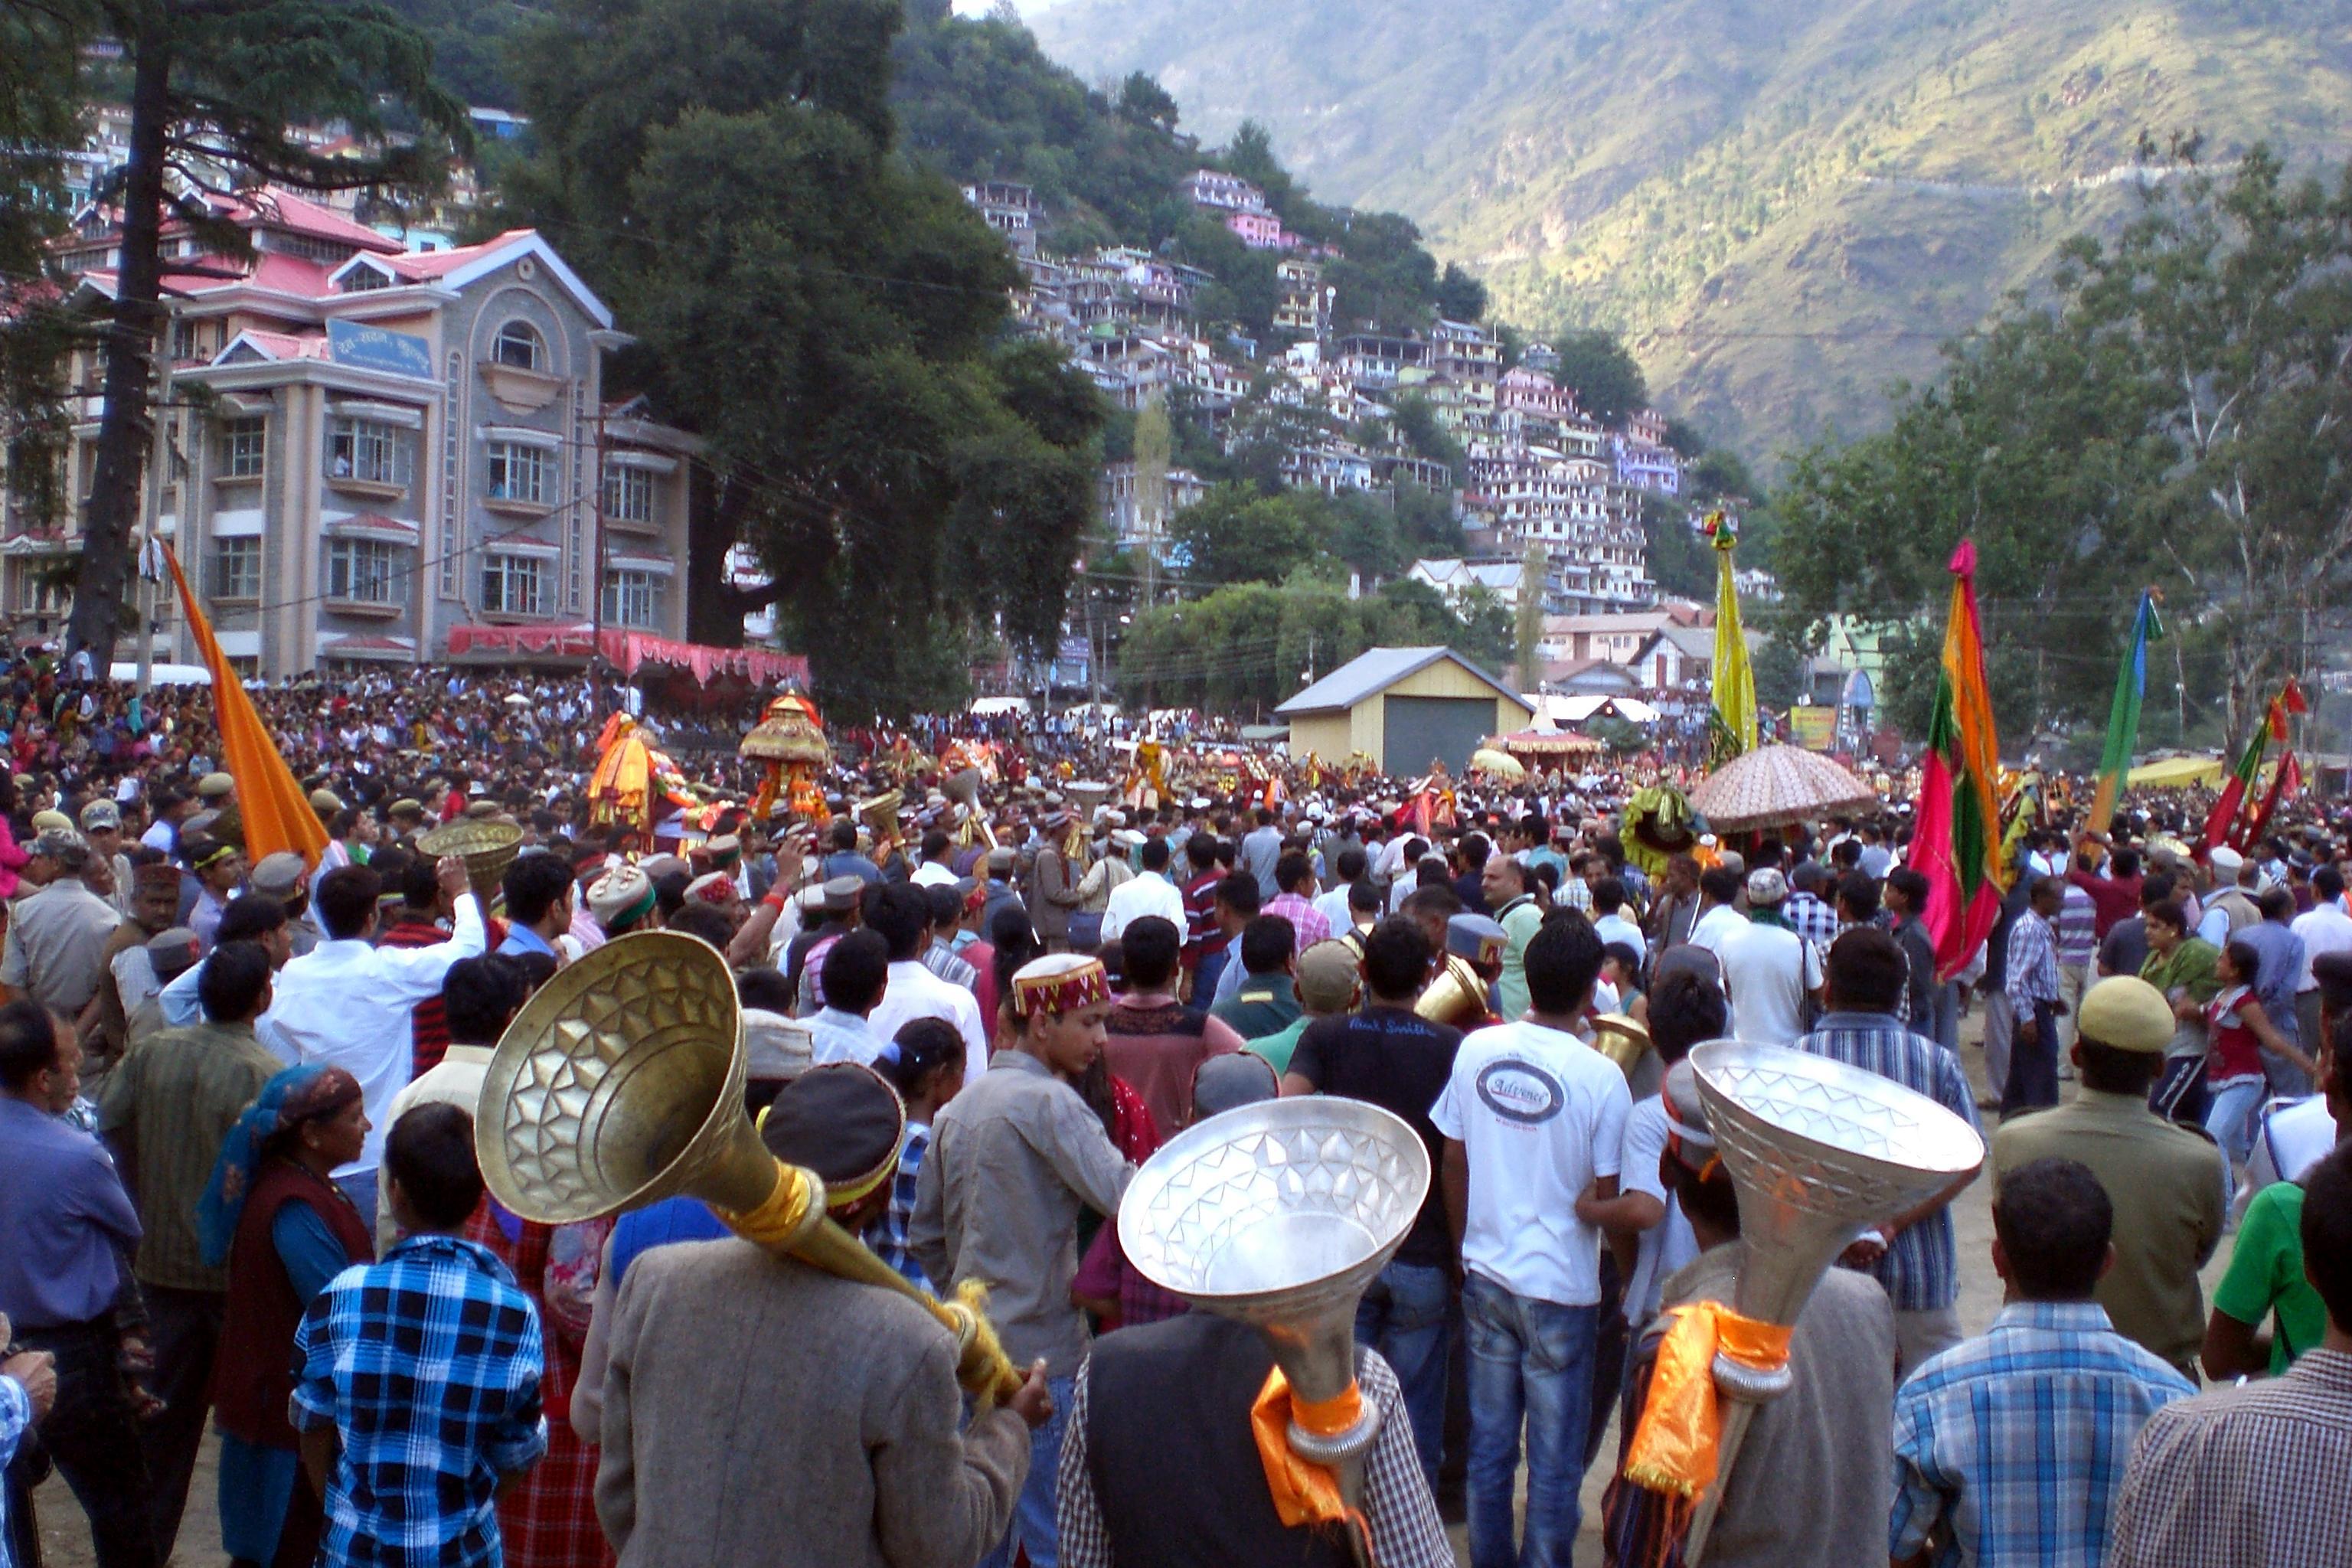 File:Kullu Dussehra - main procession.jpg - Wikimedia Commons